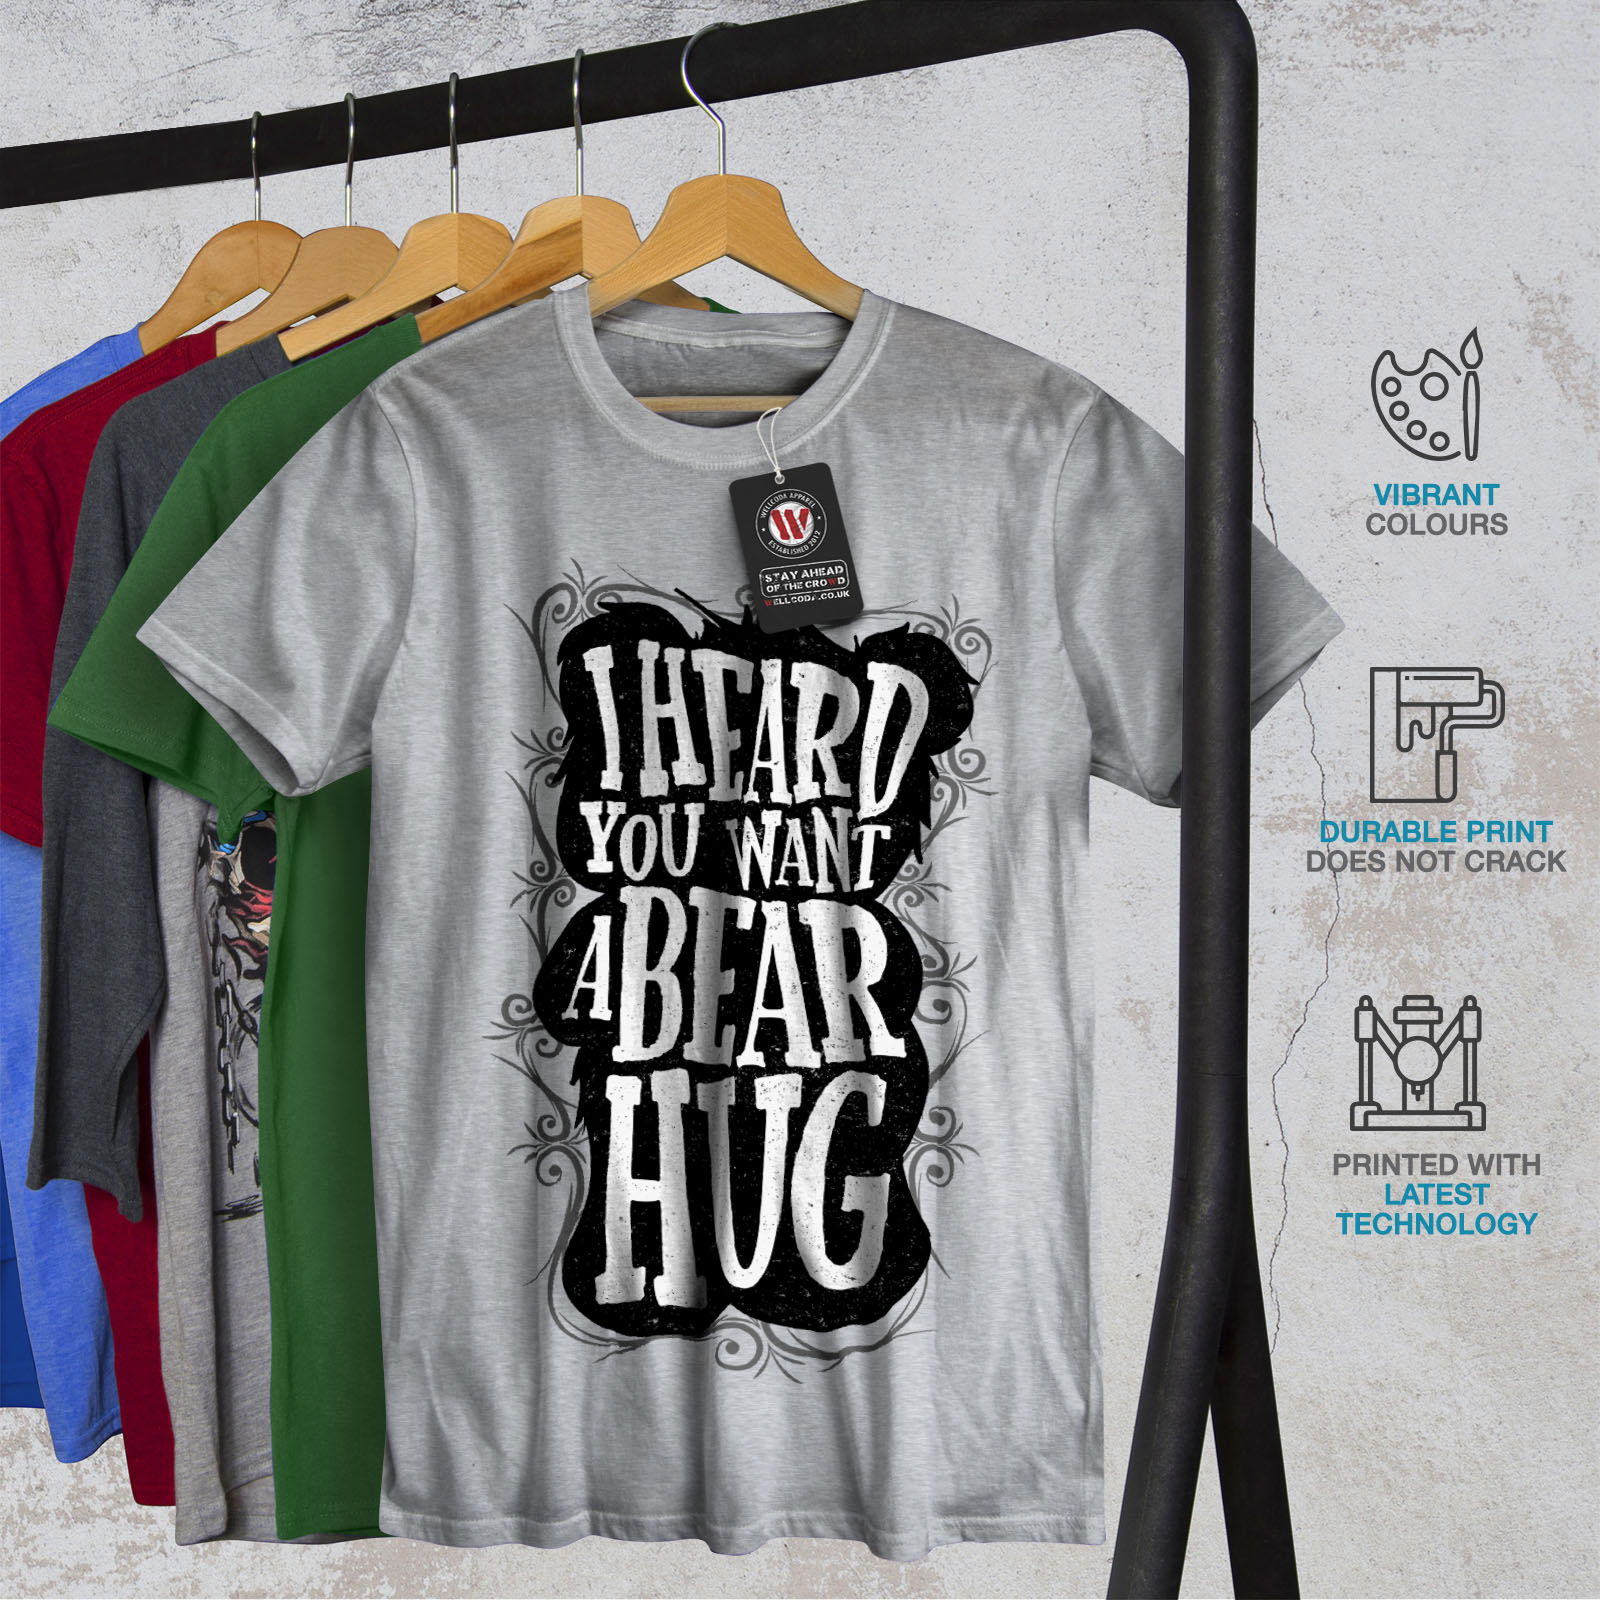 Wellcoda Heard You Bear Hug Funny Mens T-shirt Graphic Design Printed Tee